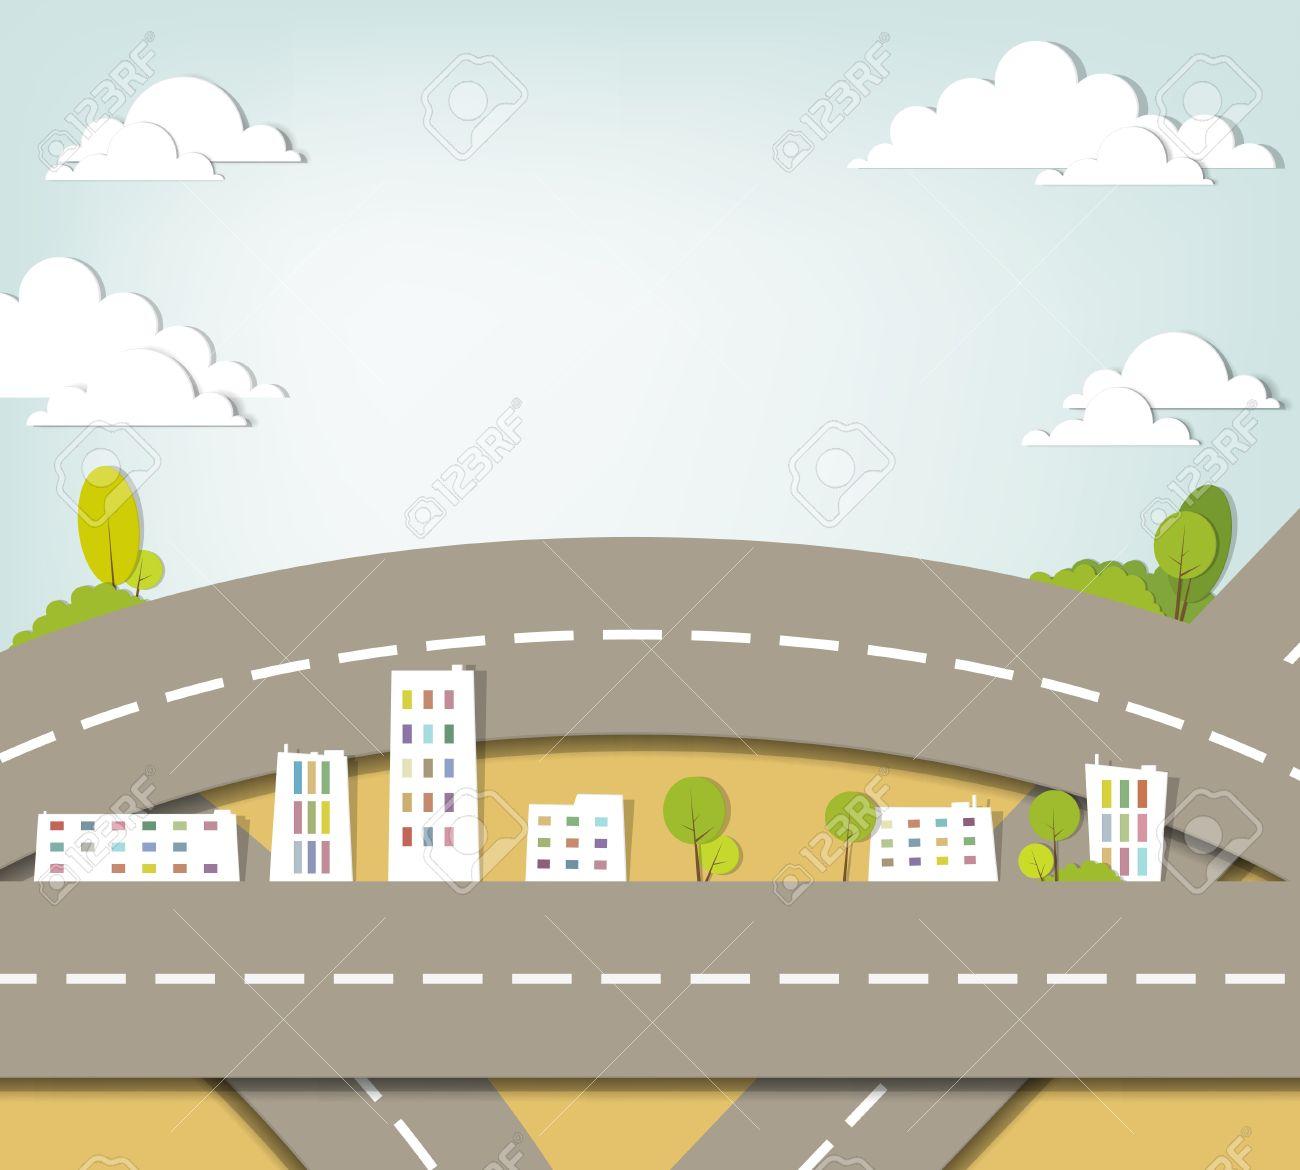 creative urban landscape applique - 15144379